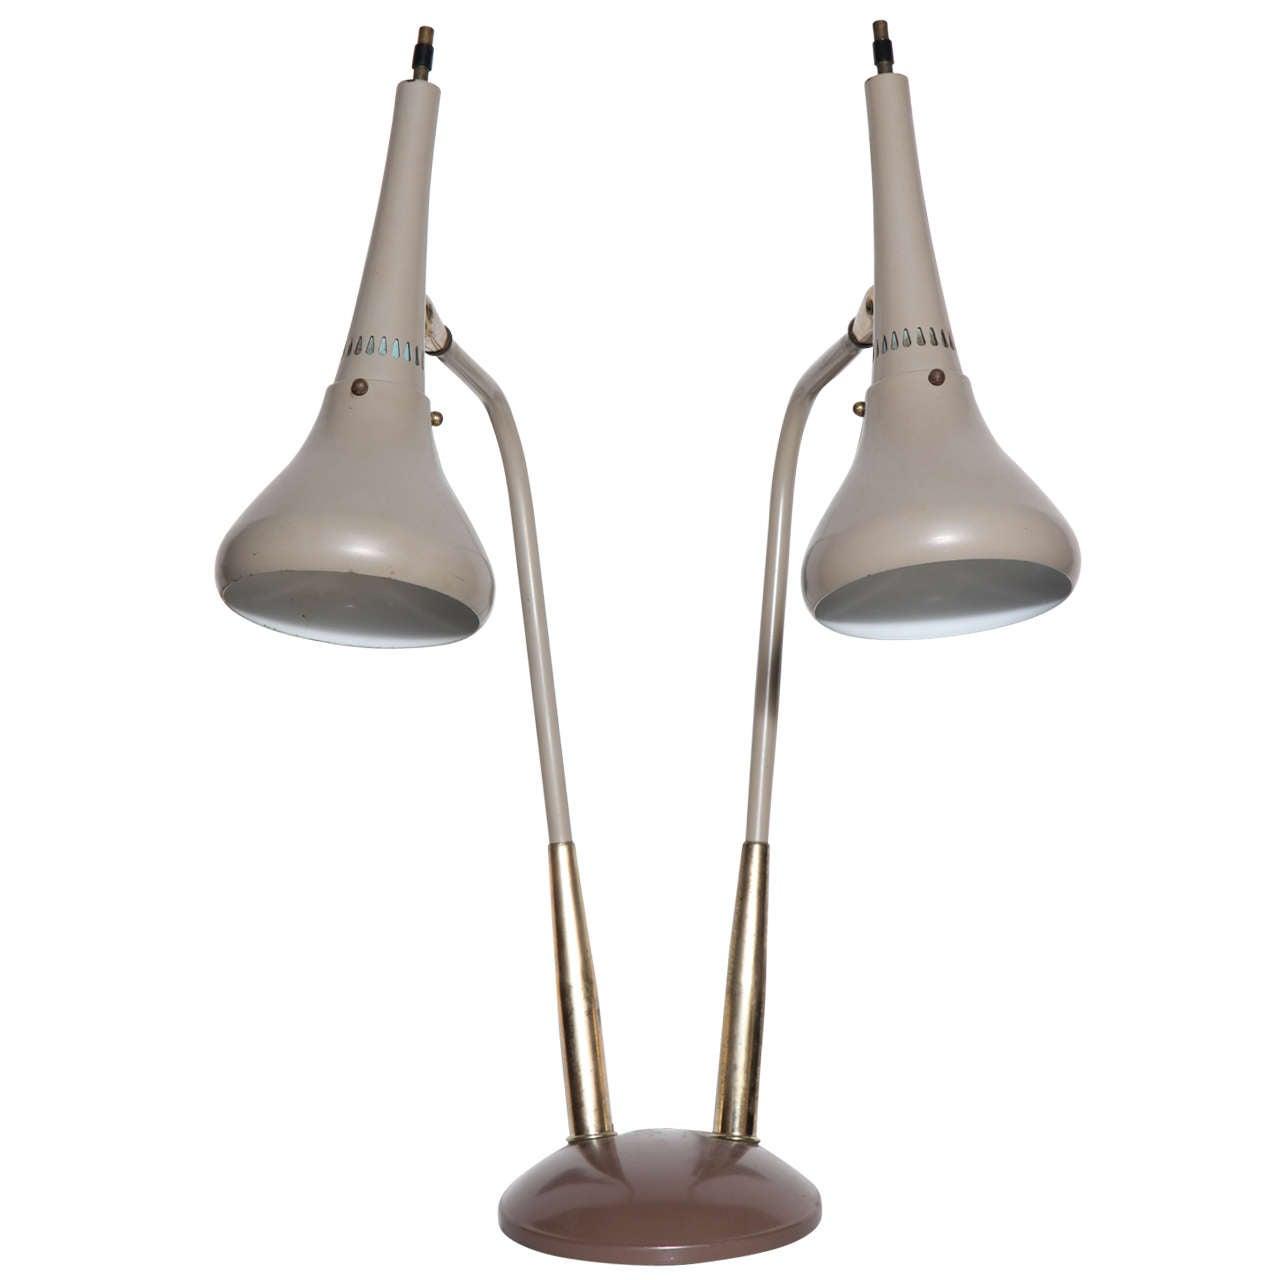 Rare gerald thurston double cone enamel and brass table lamp at rare gerald thurston double cone enamel brass table lamp 1 geotapseo Image collections